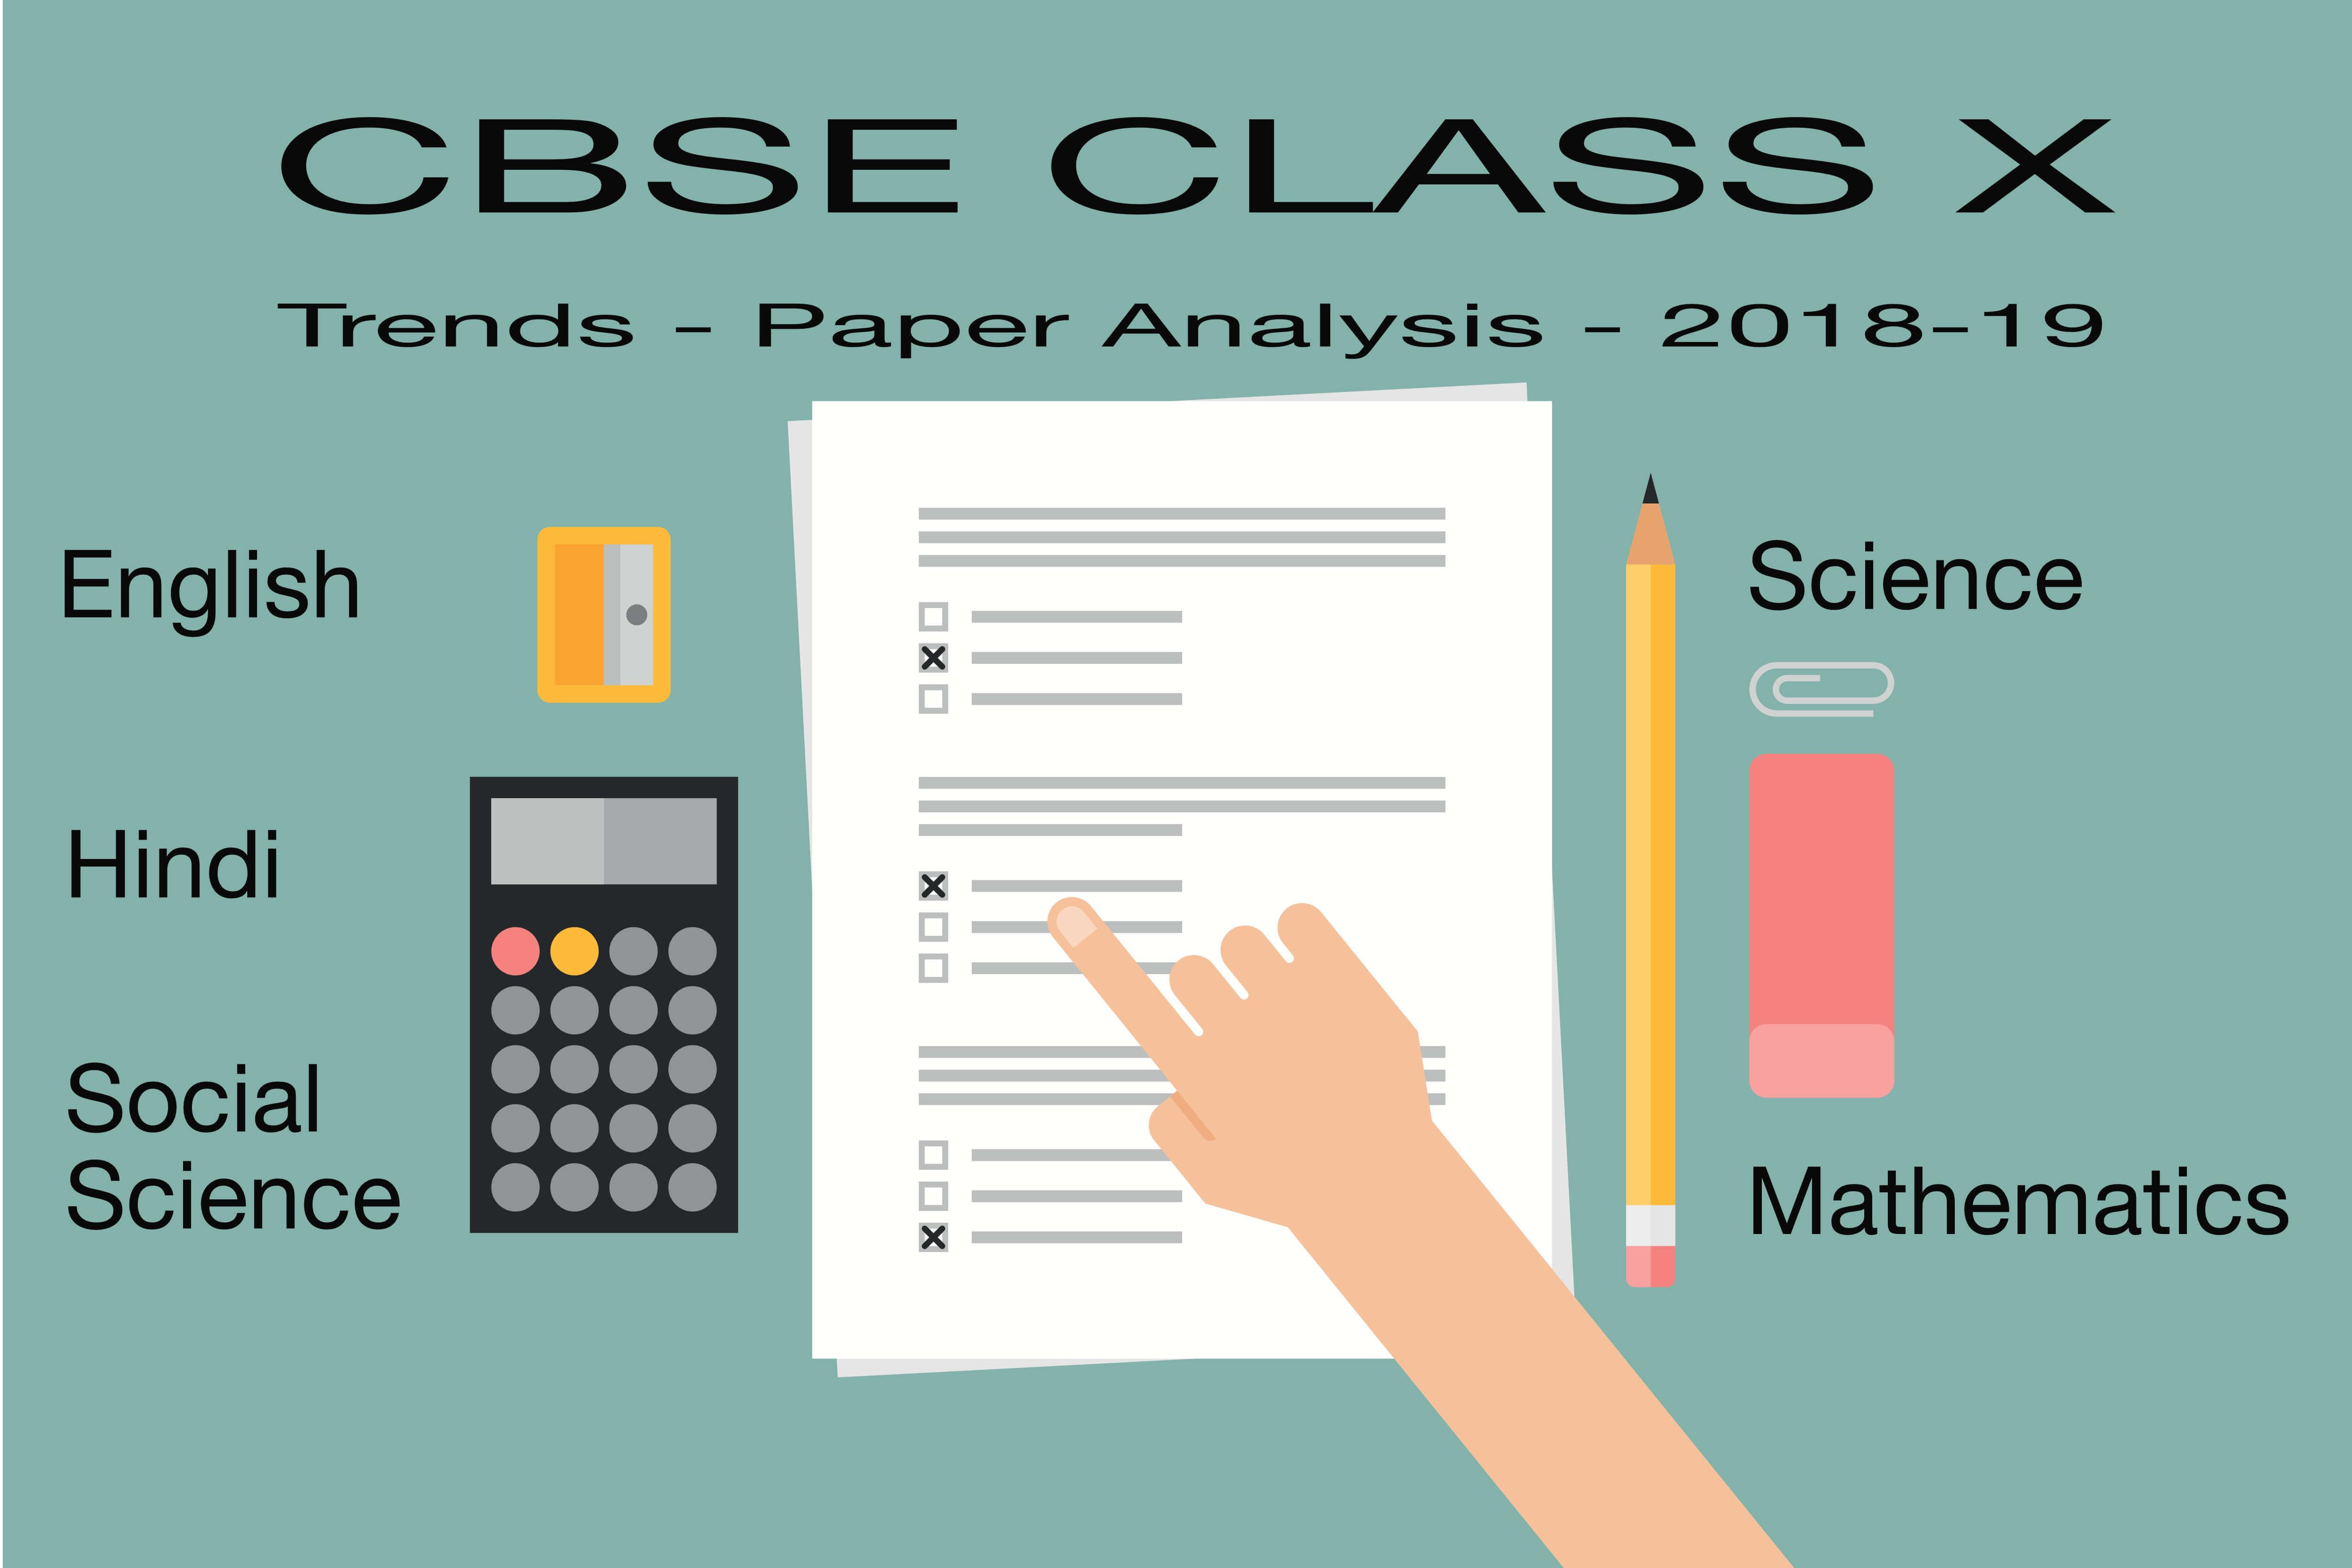 CBSE Class 10 Exam Trends and Analysis 2018-19